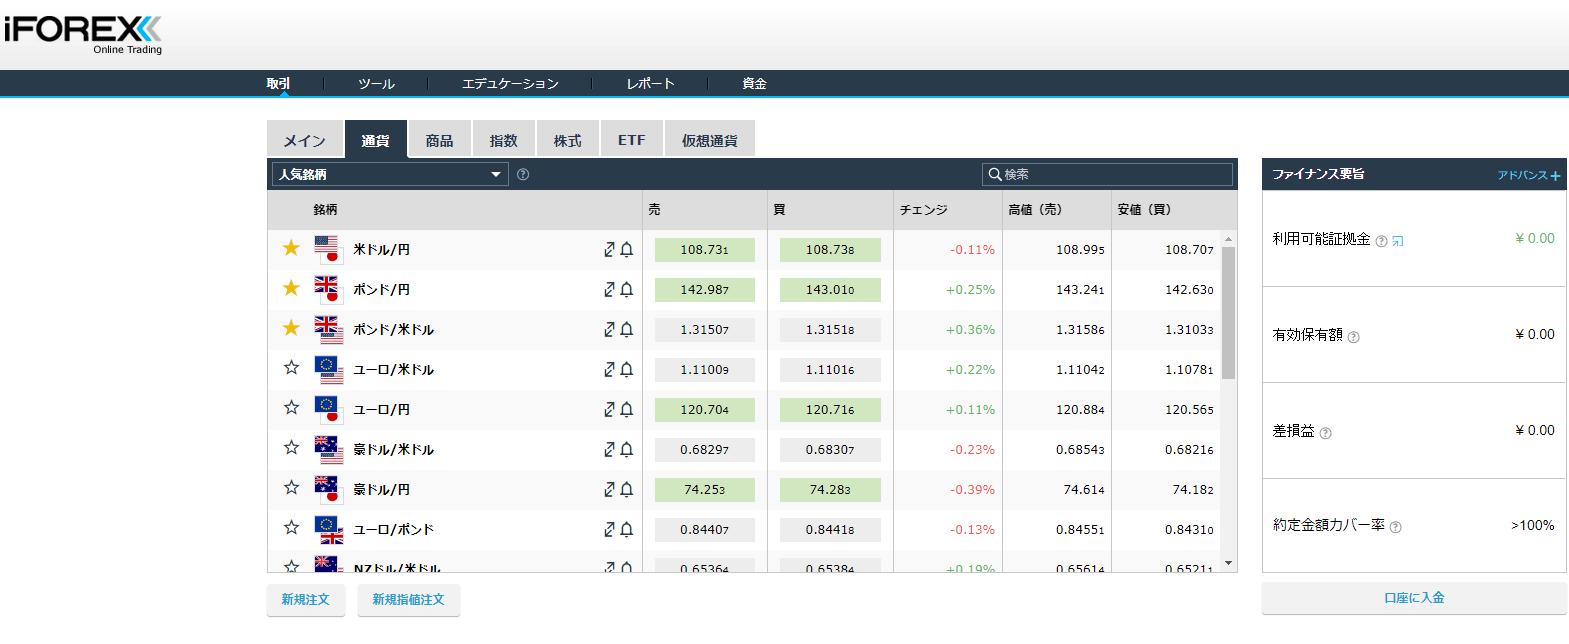 iForex 通貨一覧